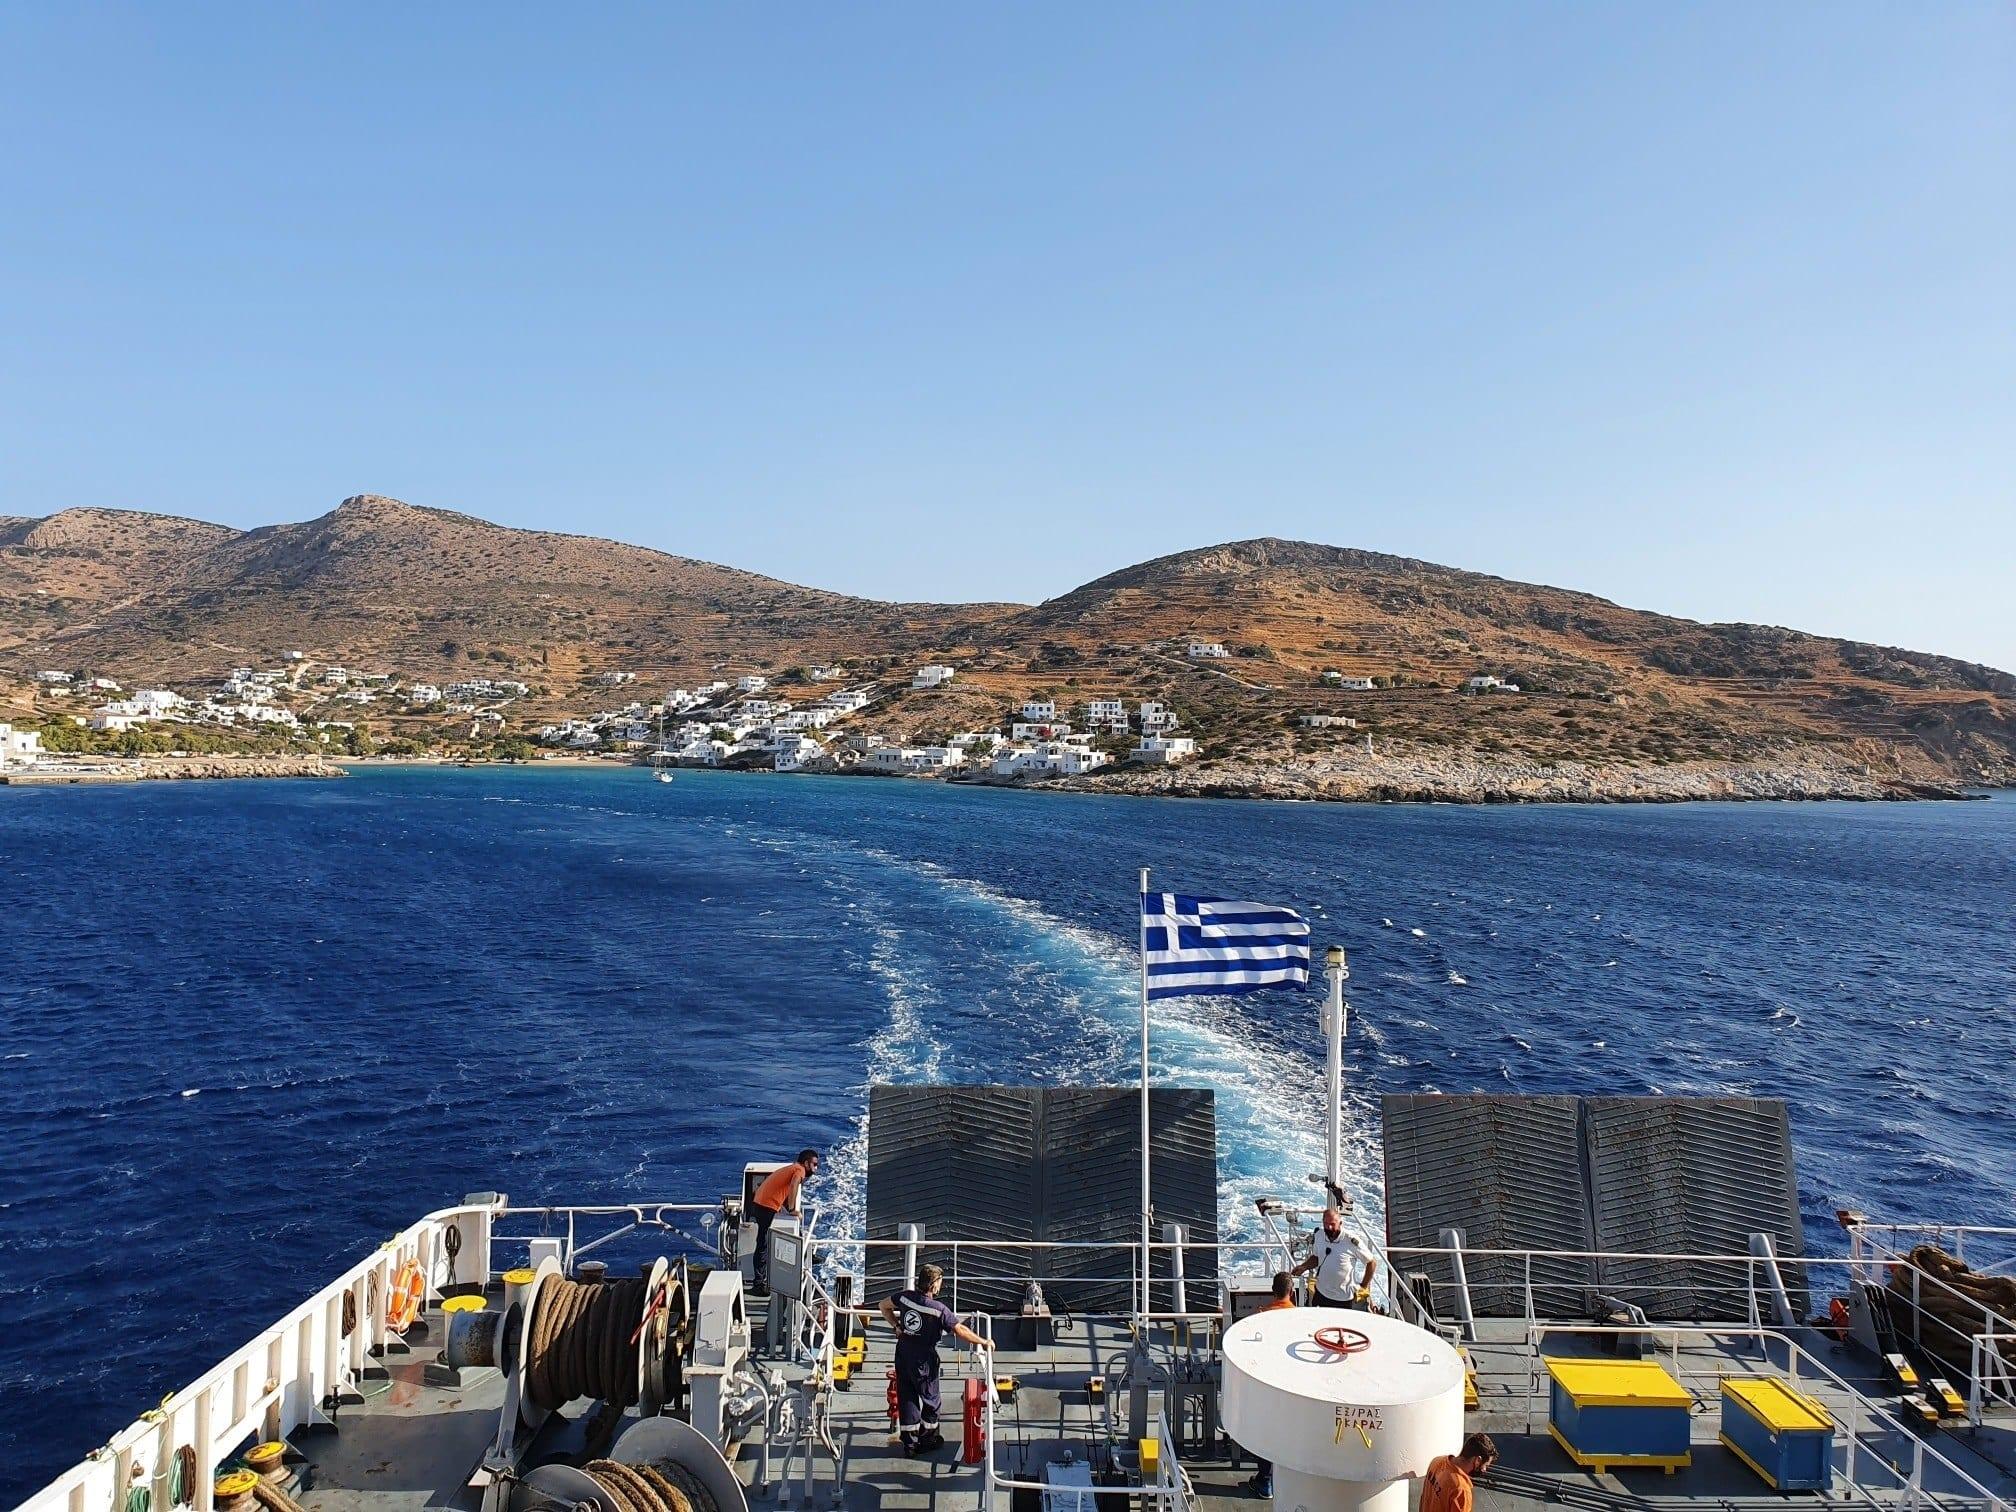 Sailing from Sikinos to Folegandros